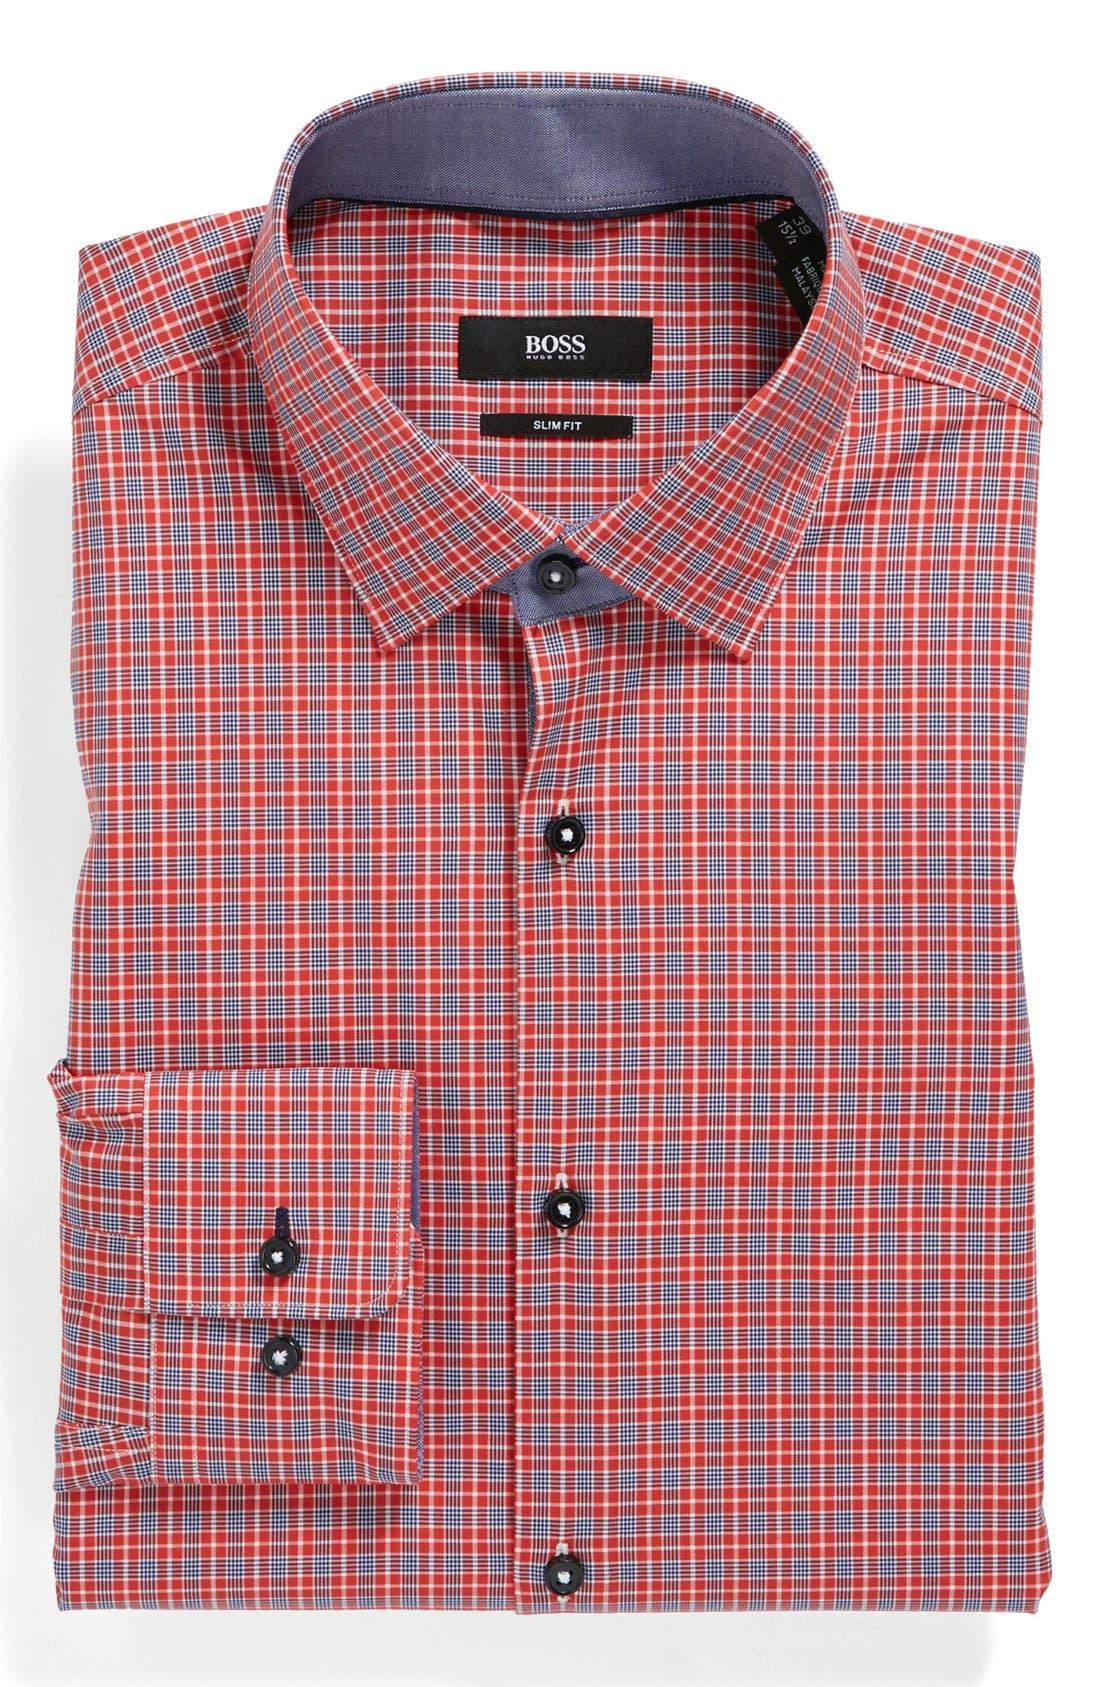 Main Image - BOSS HUGO BOSS 'Juri' Slim Fit Easy Iron Dress Shirt